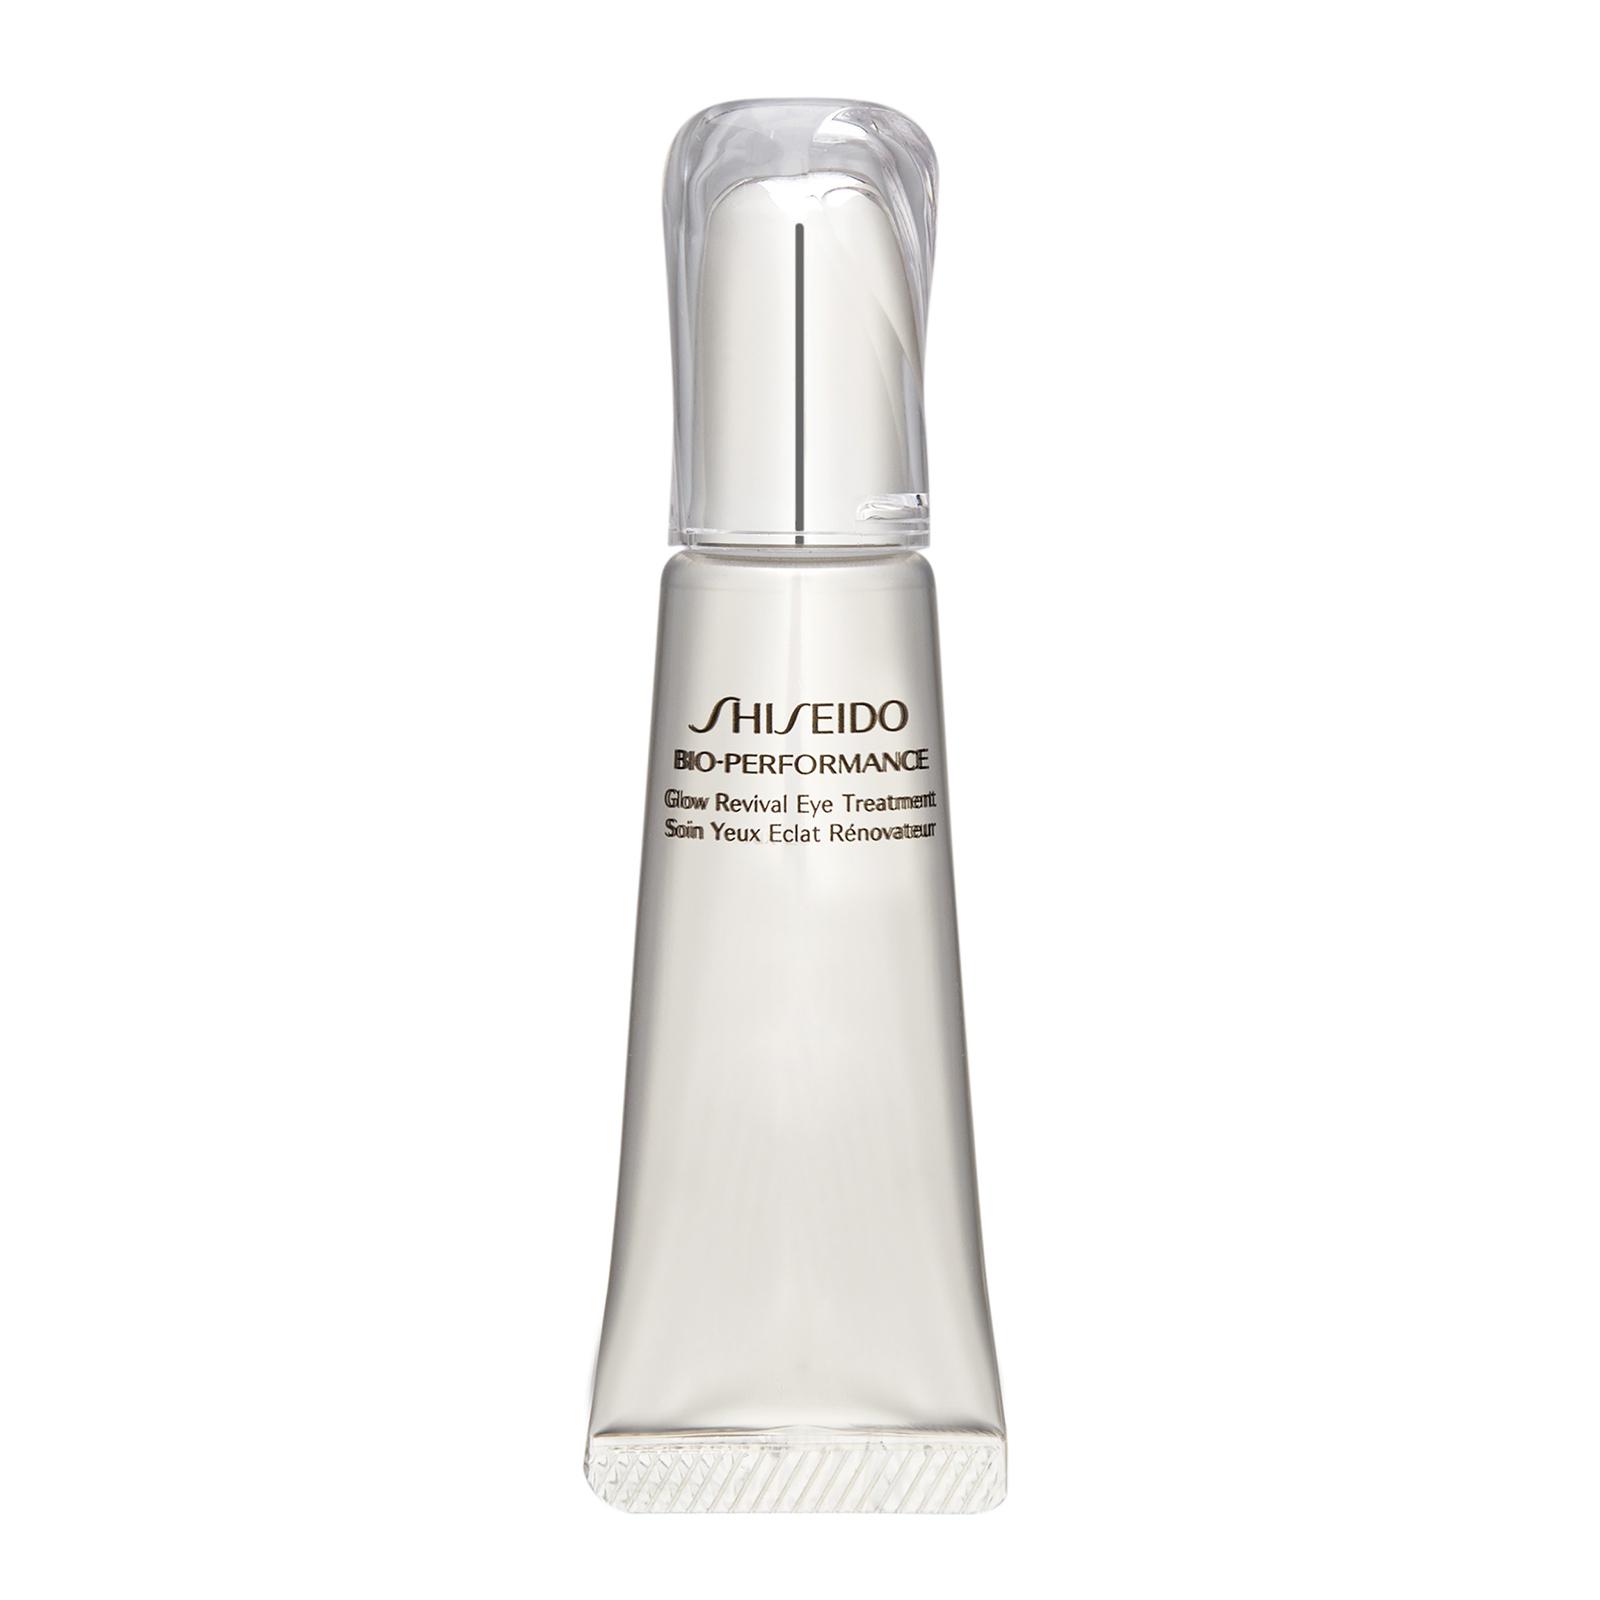 Shiseido Bio-Performance Glow Revival Eye Treatment 0.54, 15ml